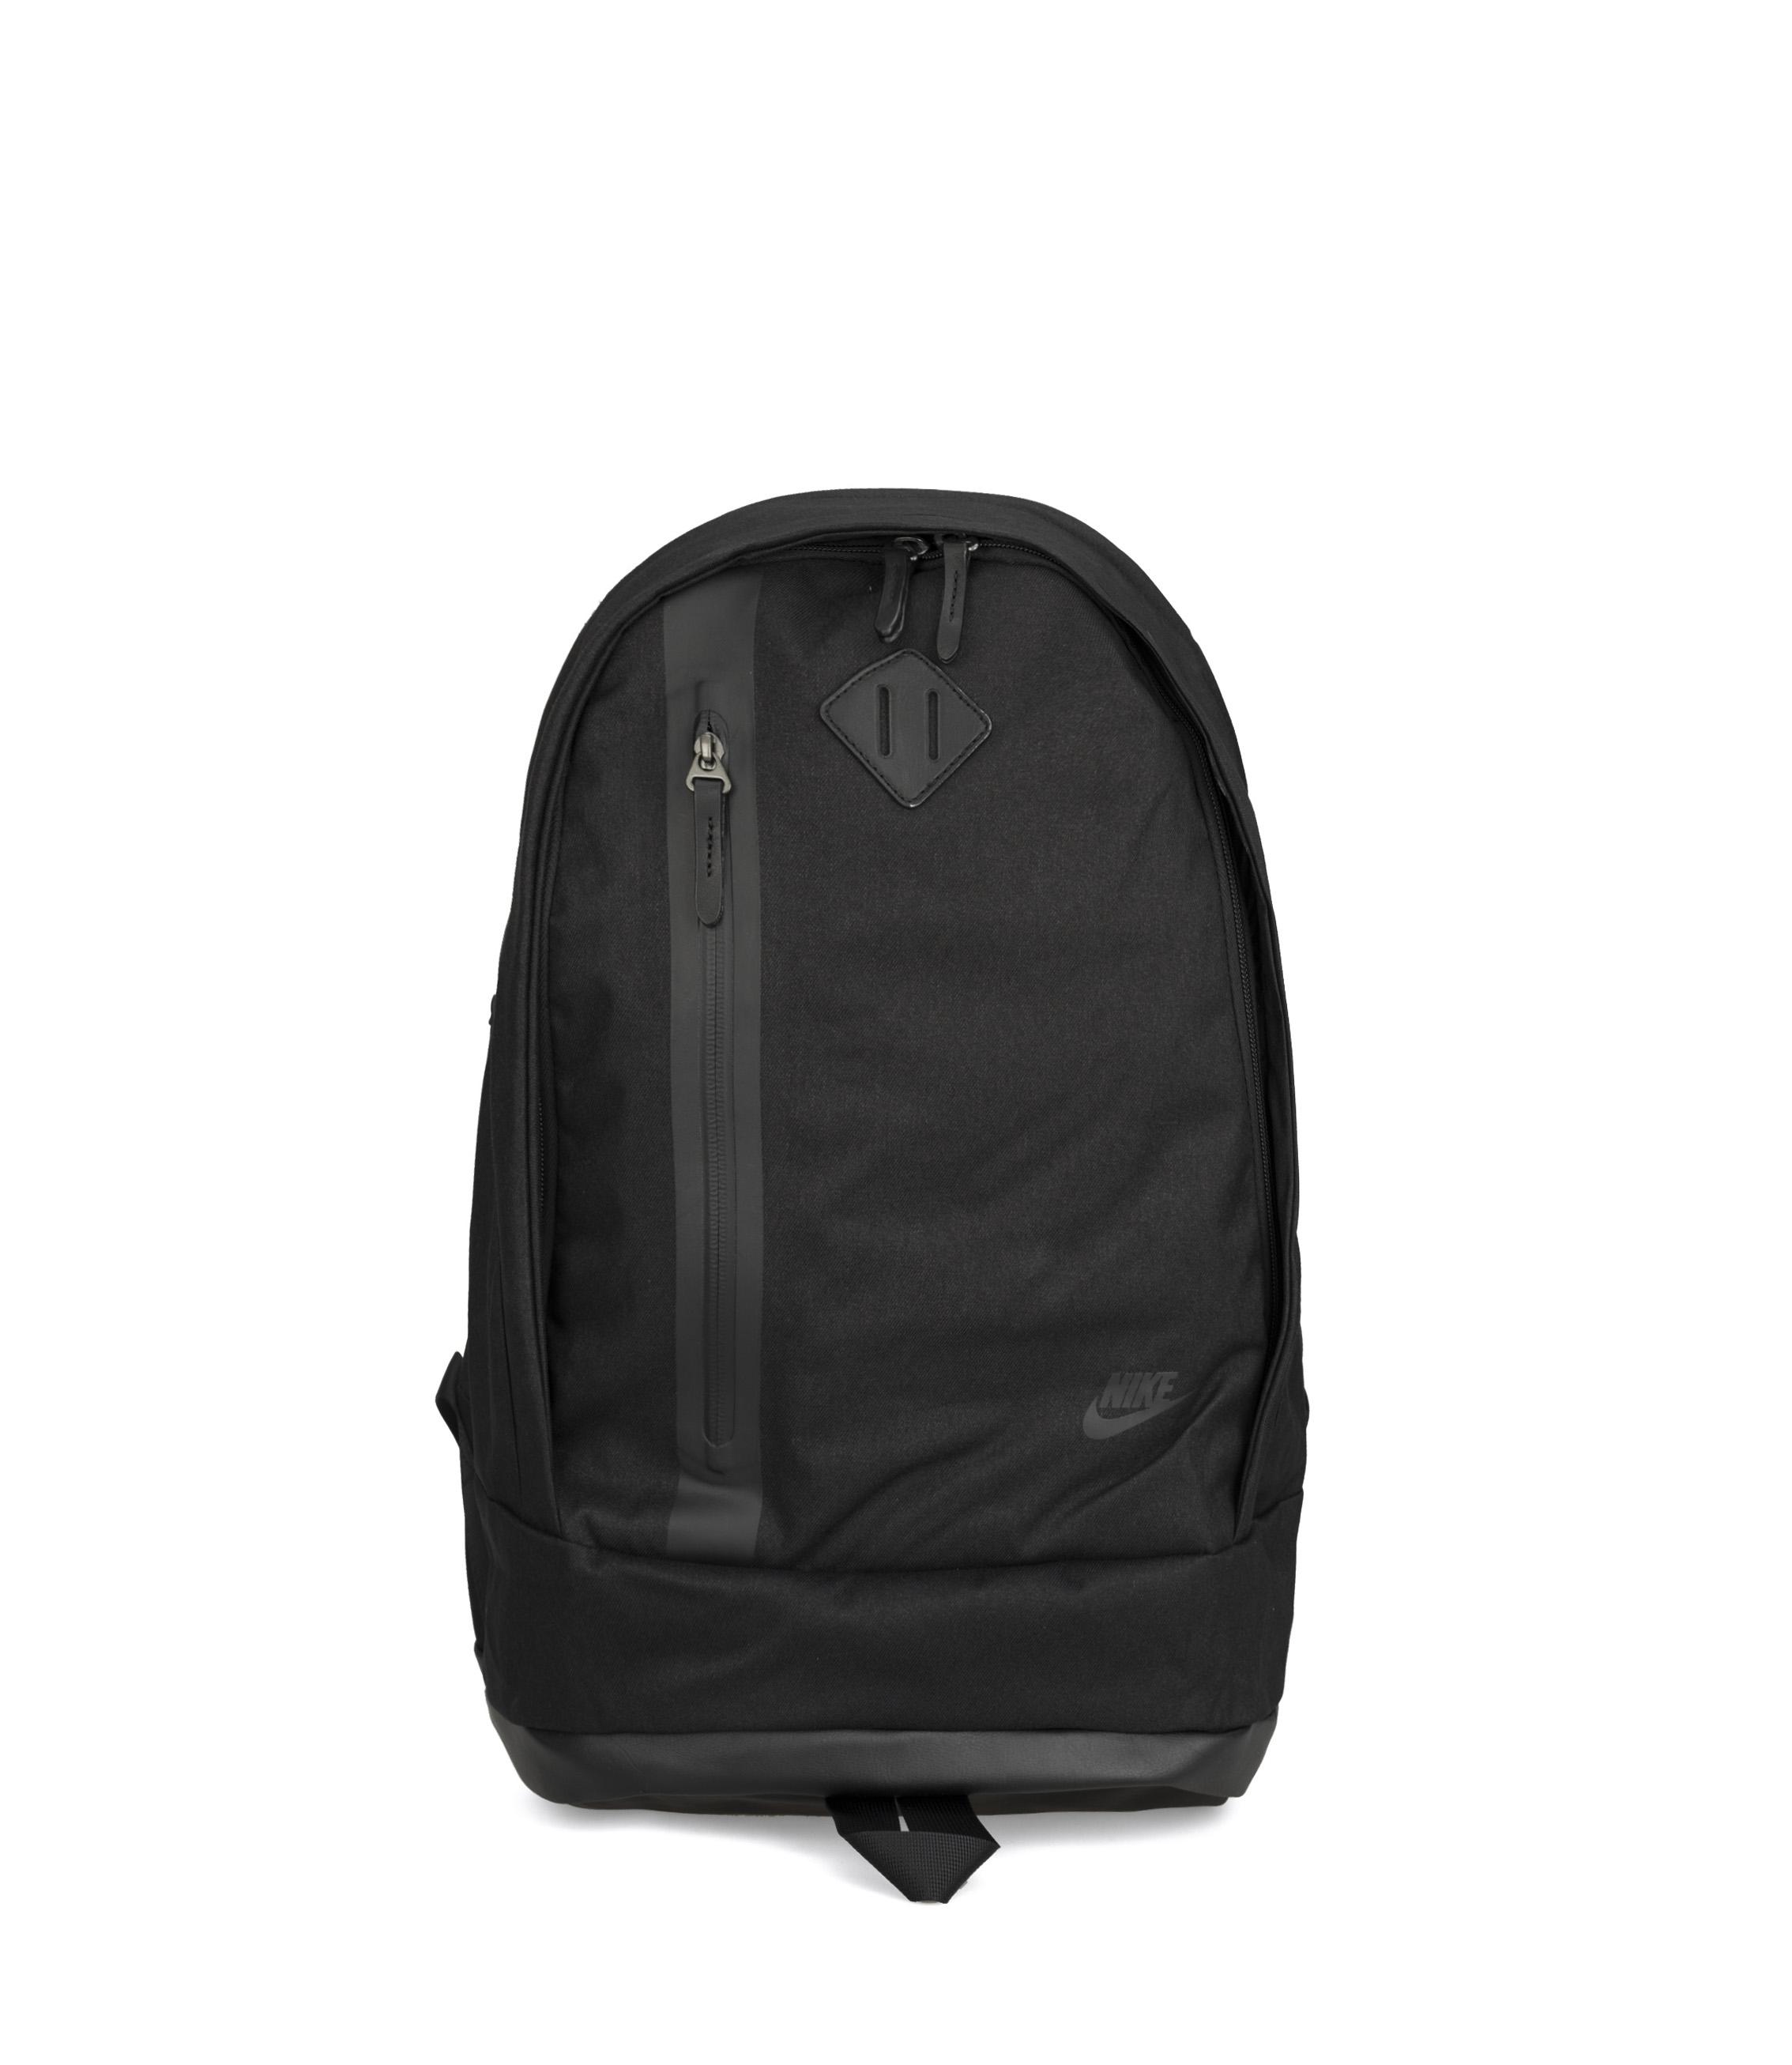 Shop Nike Cheyenne 3.0 Premium Backpack Black at ITK online